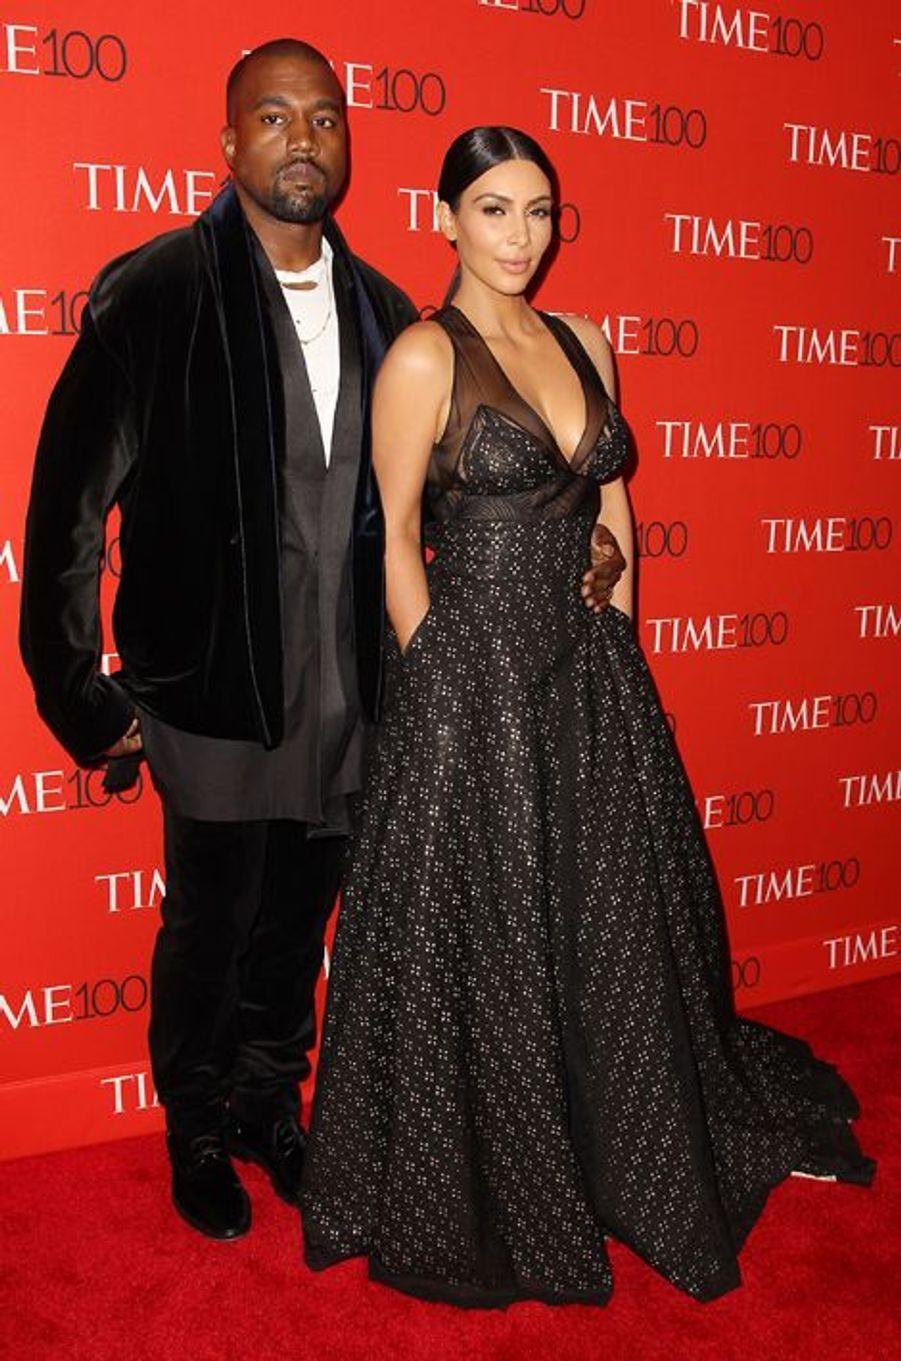 Kanye West et Kim Kardashian à New York le 21 avril 2015